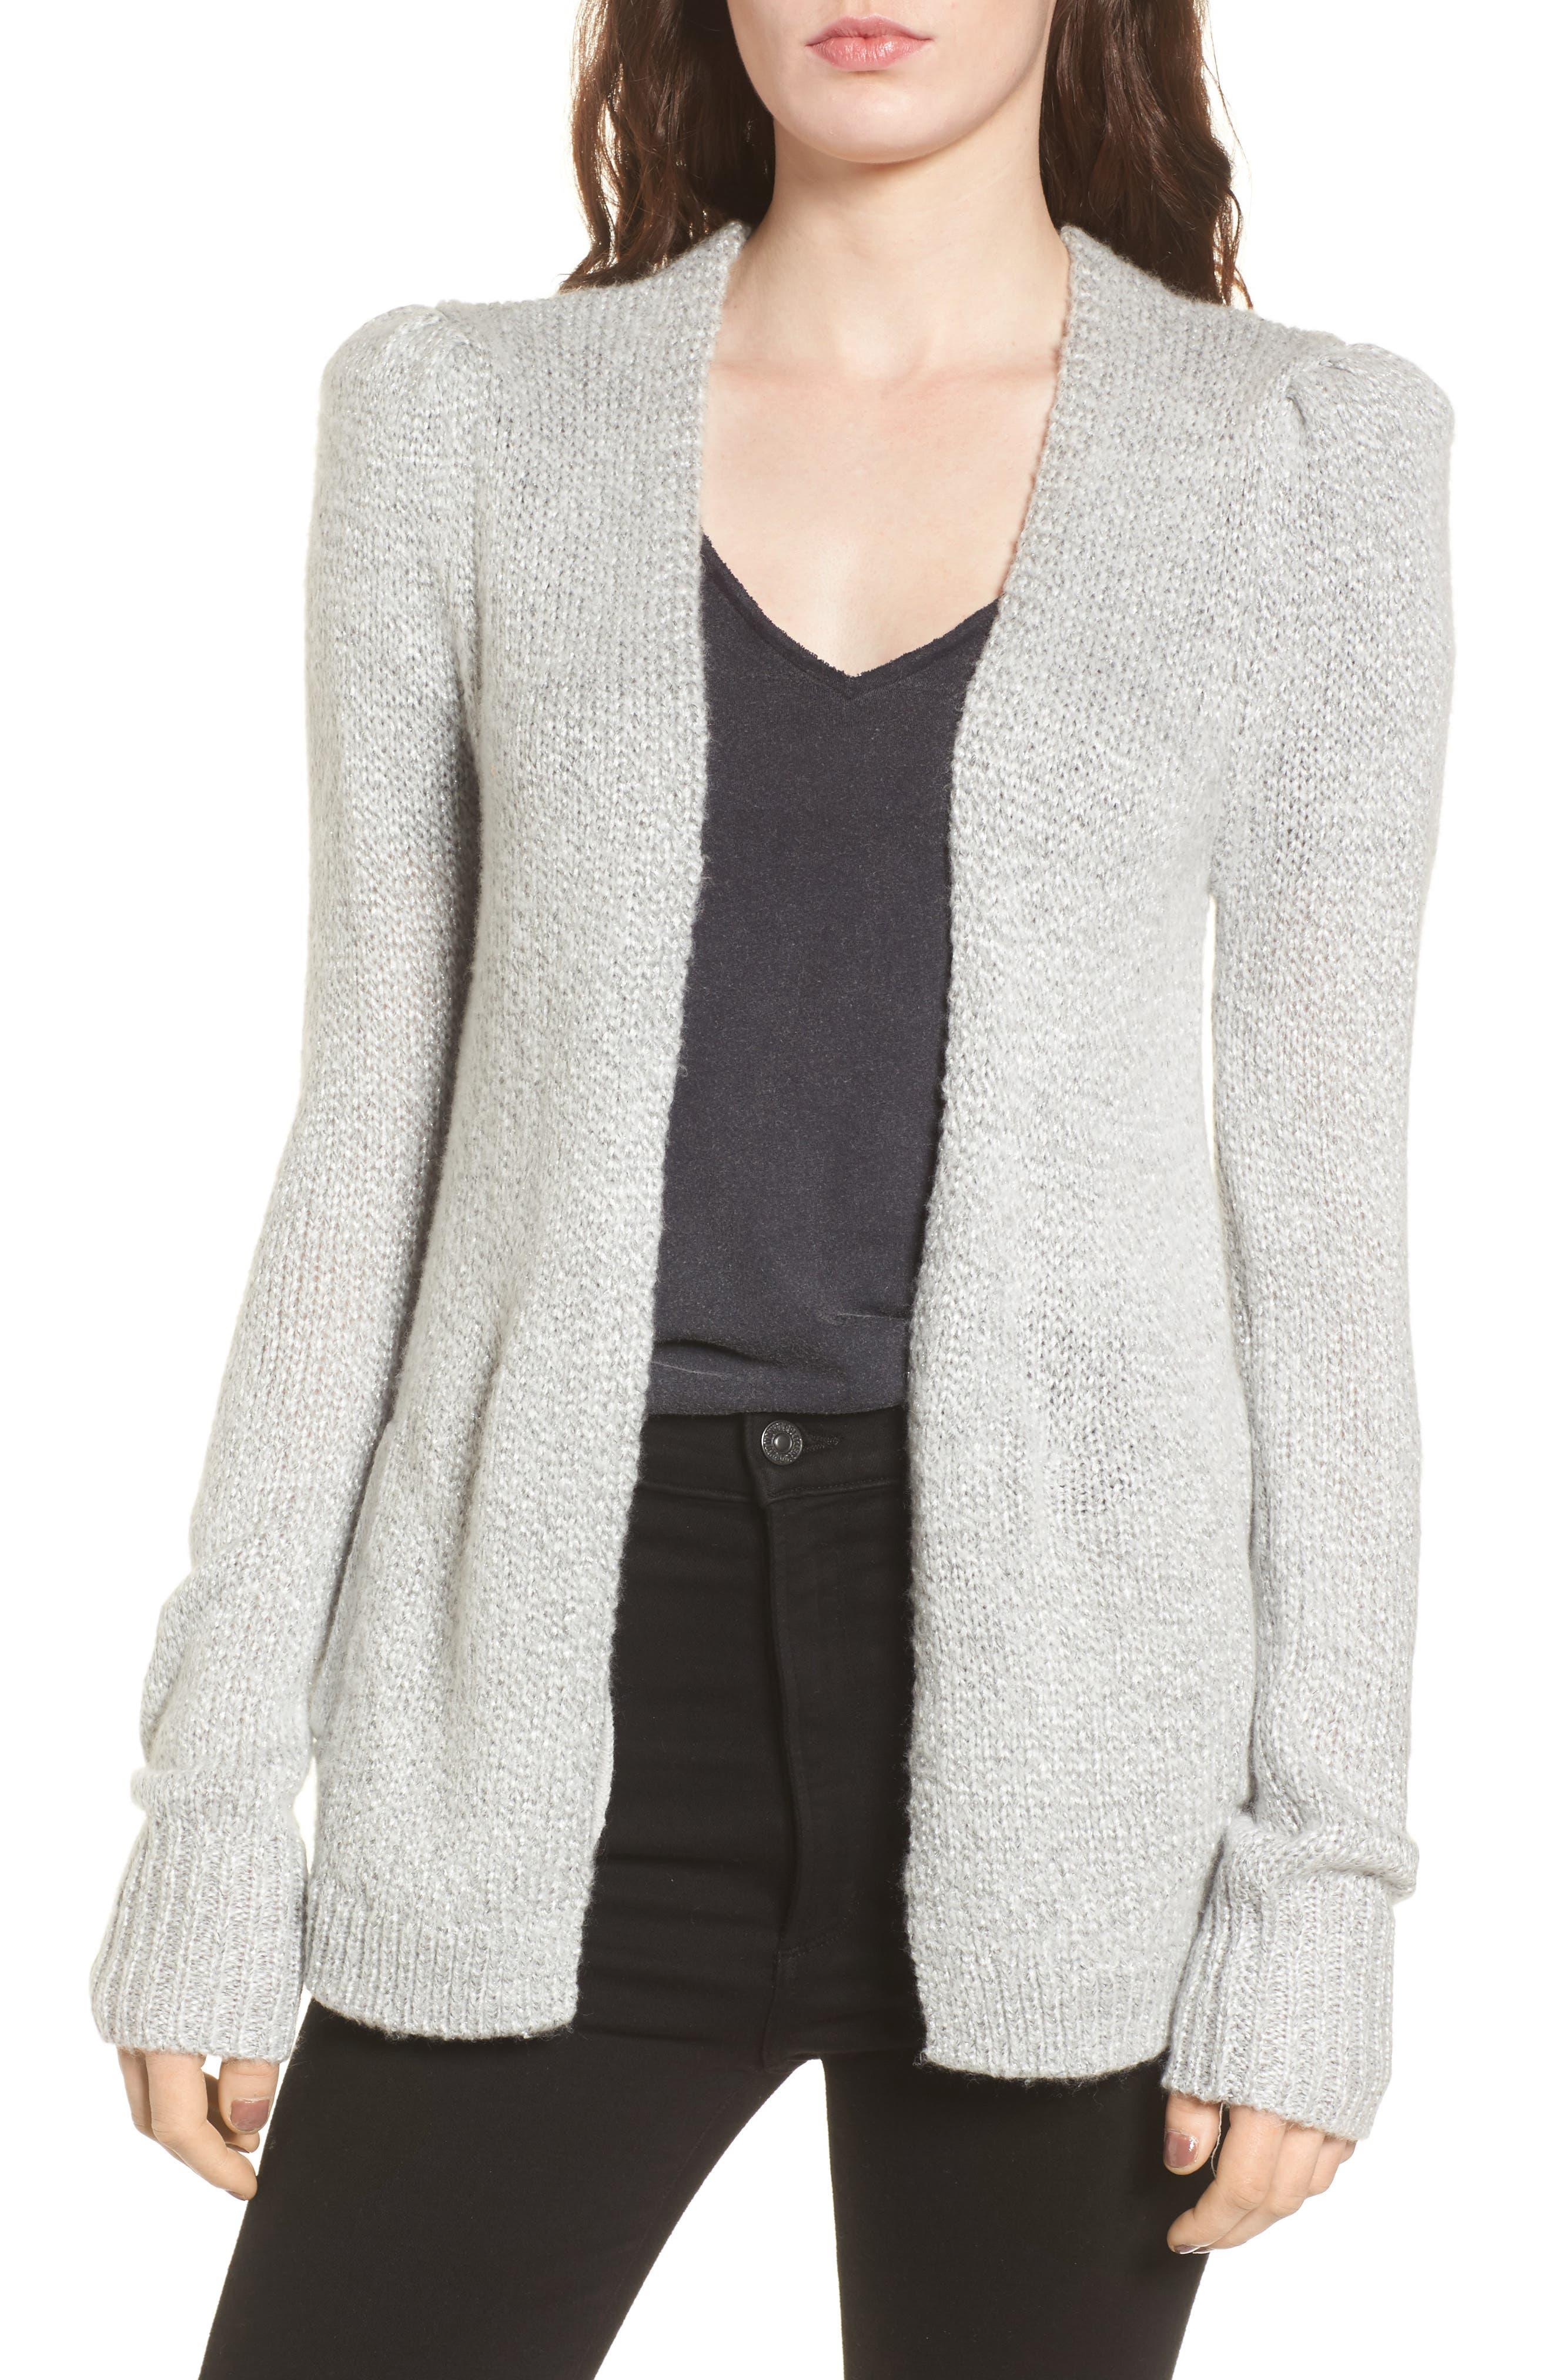 Alternate Image 1 Selected - Hinge Shine Cardigan Sweater